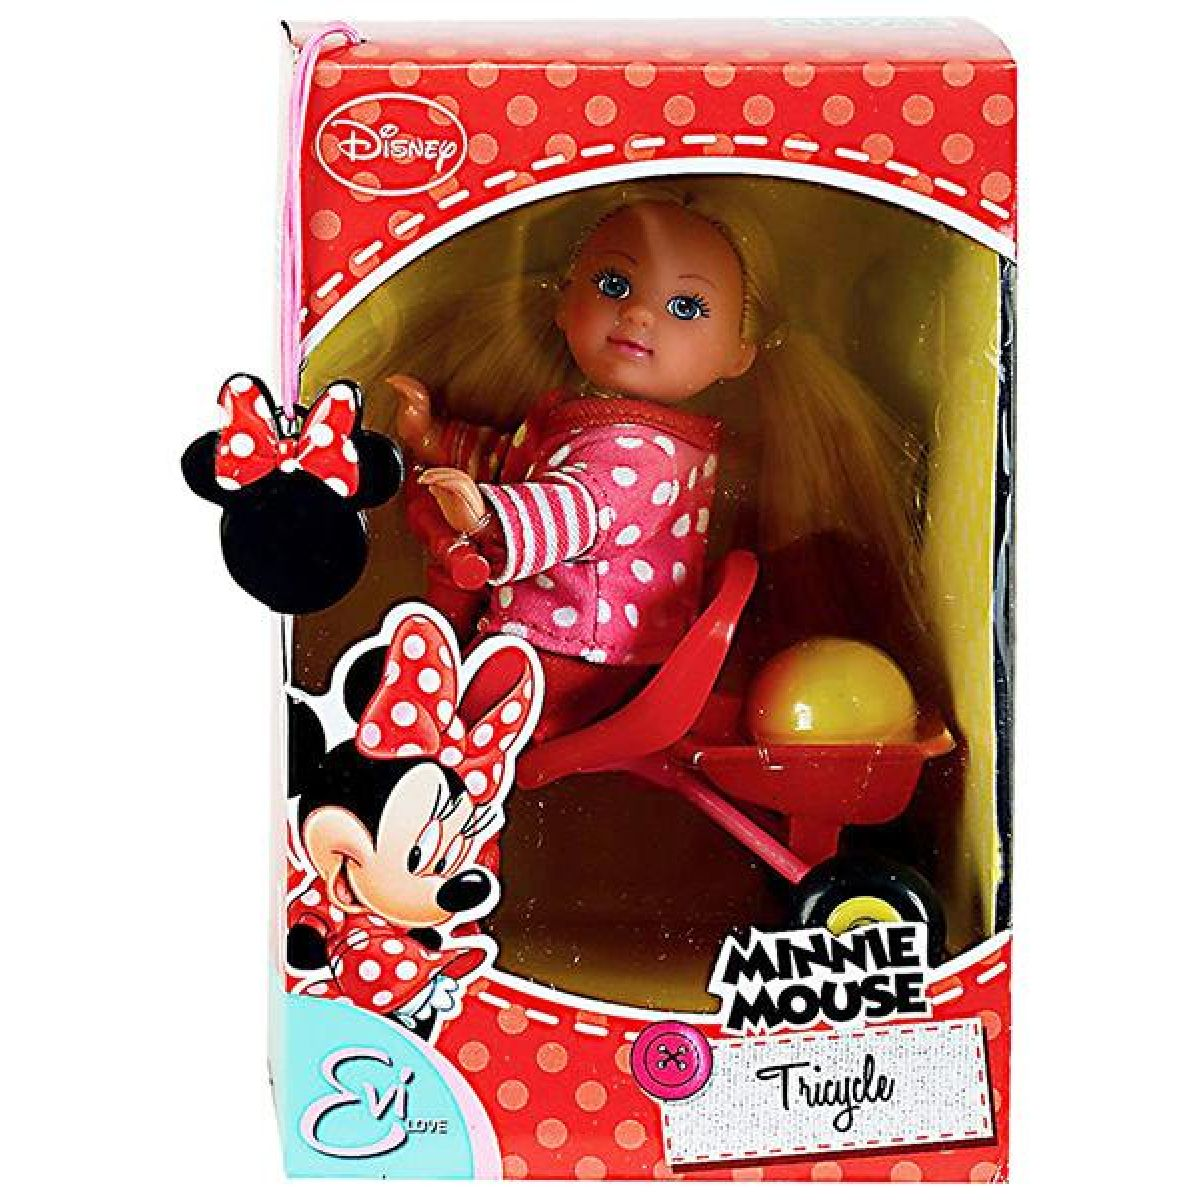 Panenka Evička Minnie Mouse na tříkolce žluté boty